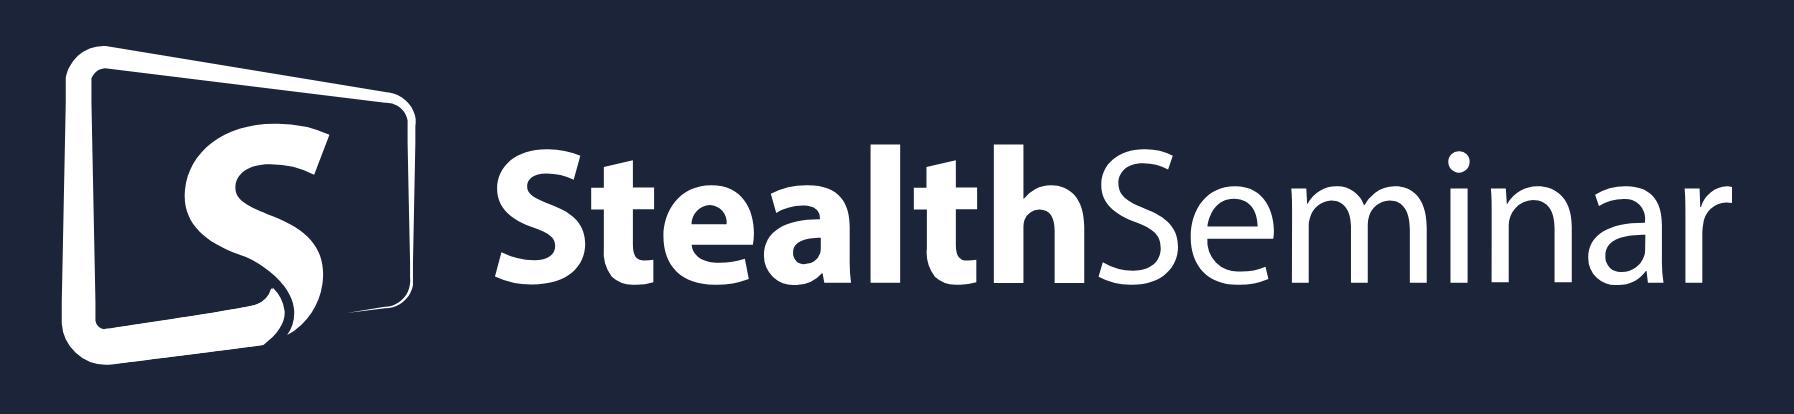 stealthseminar logo